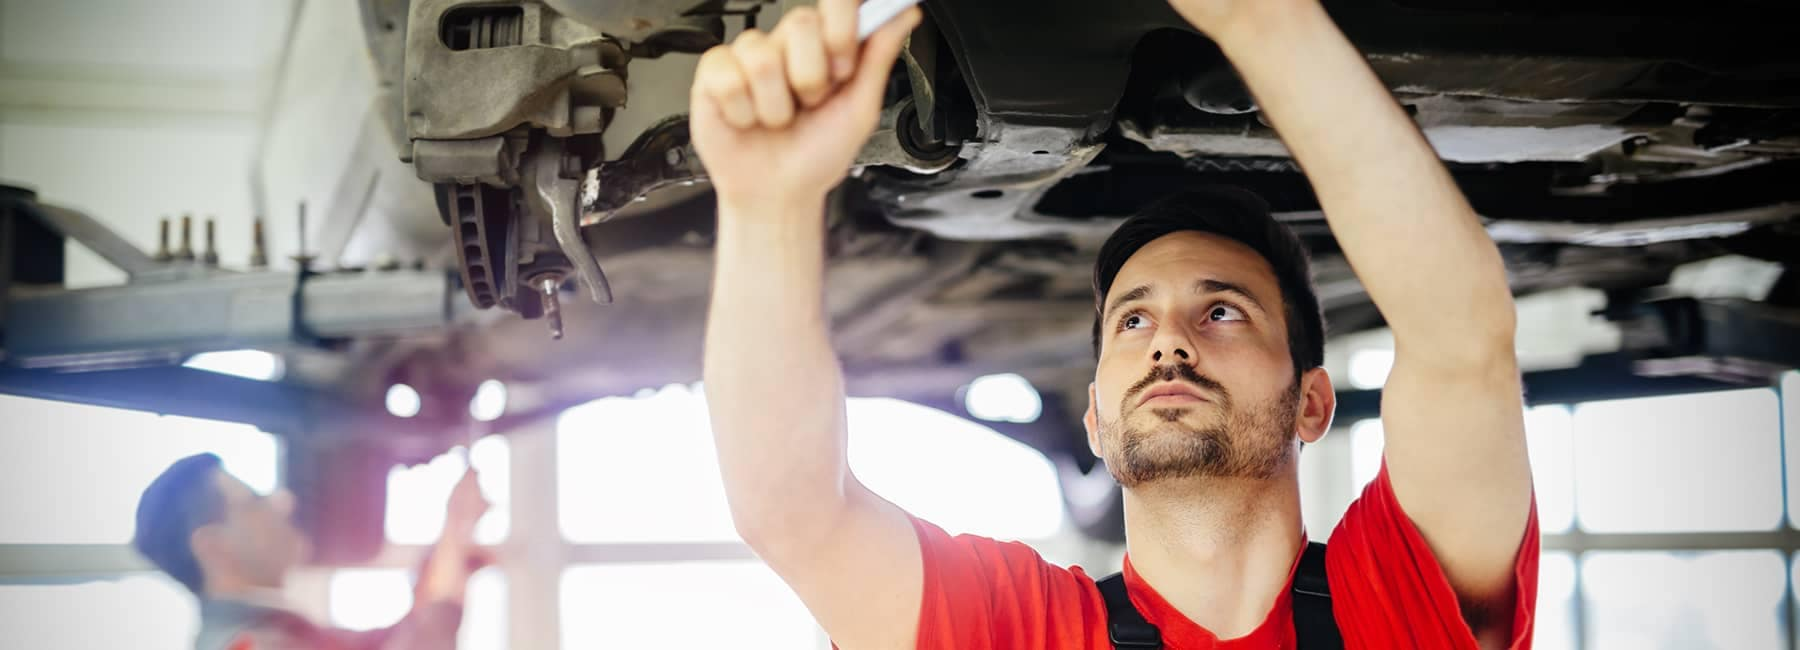 Service mechanic under car